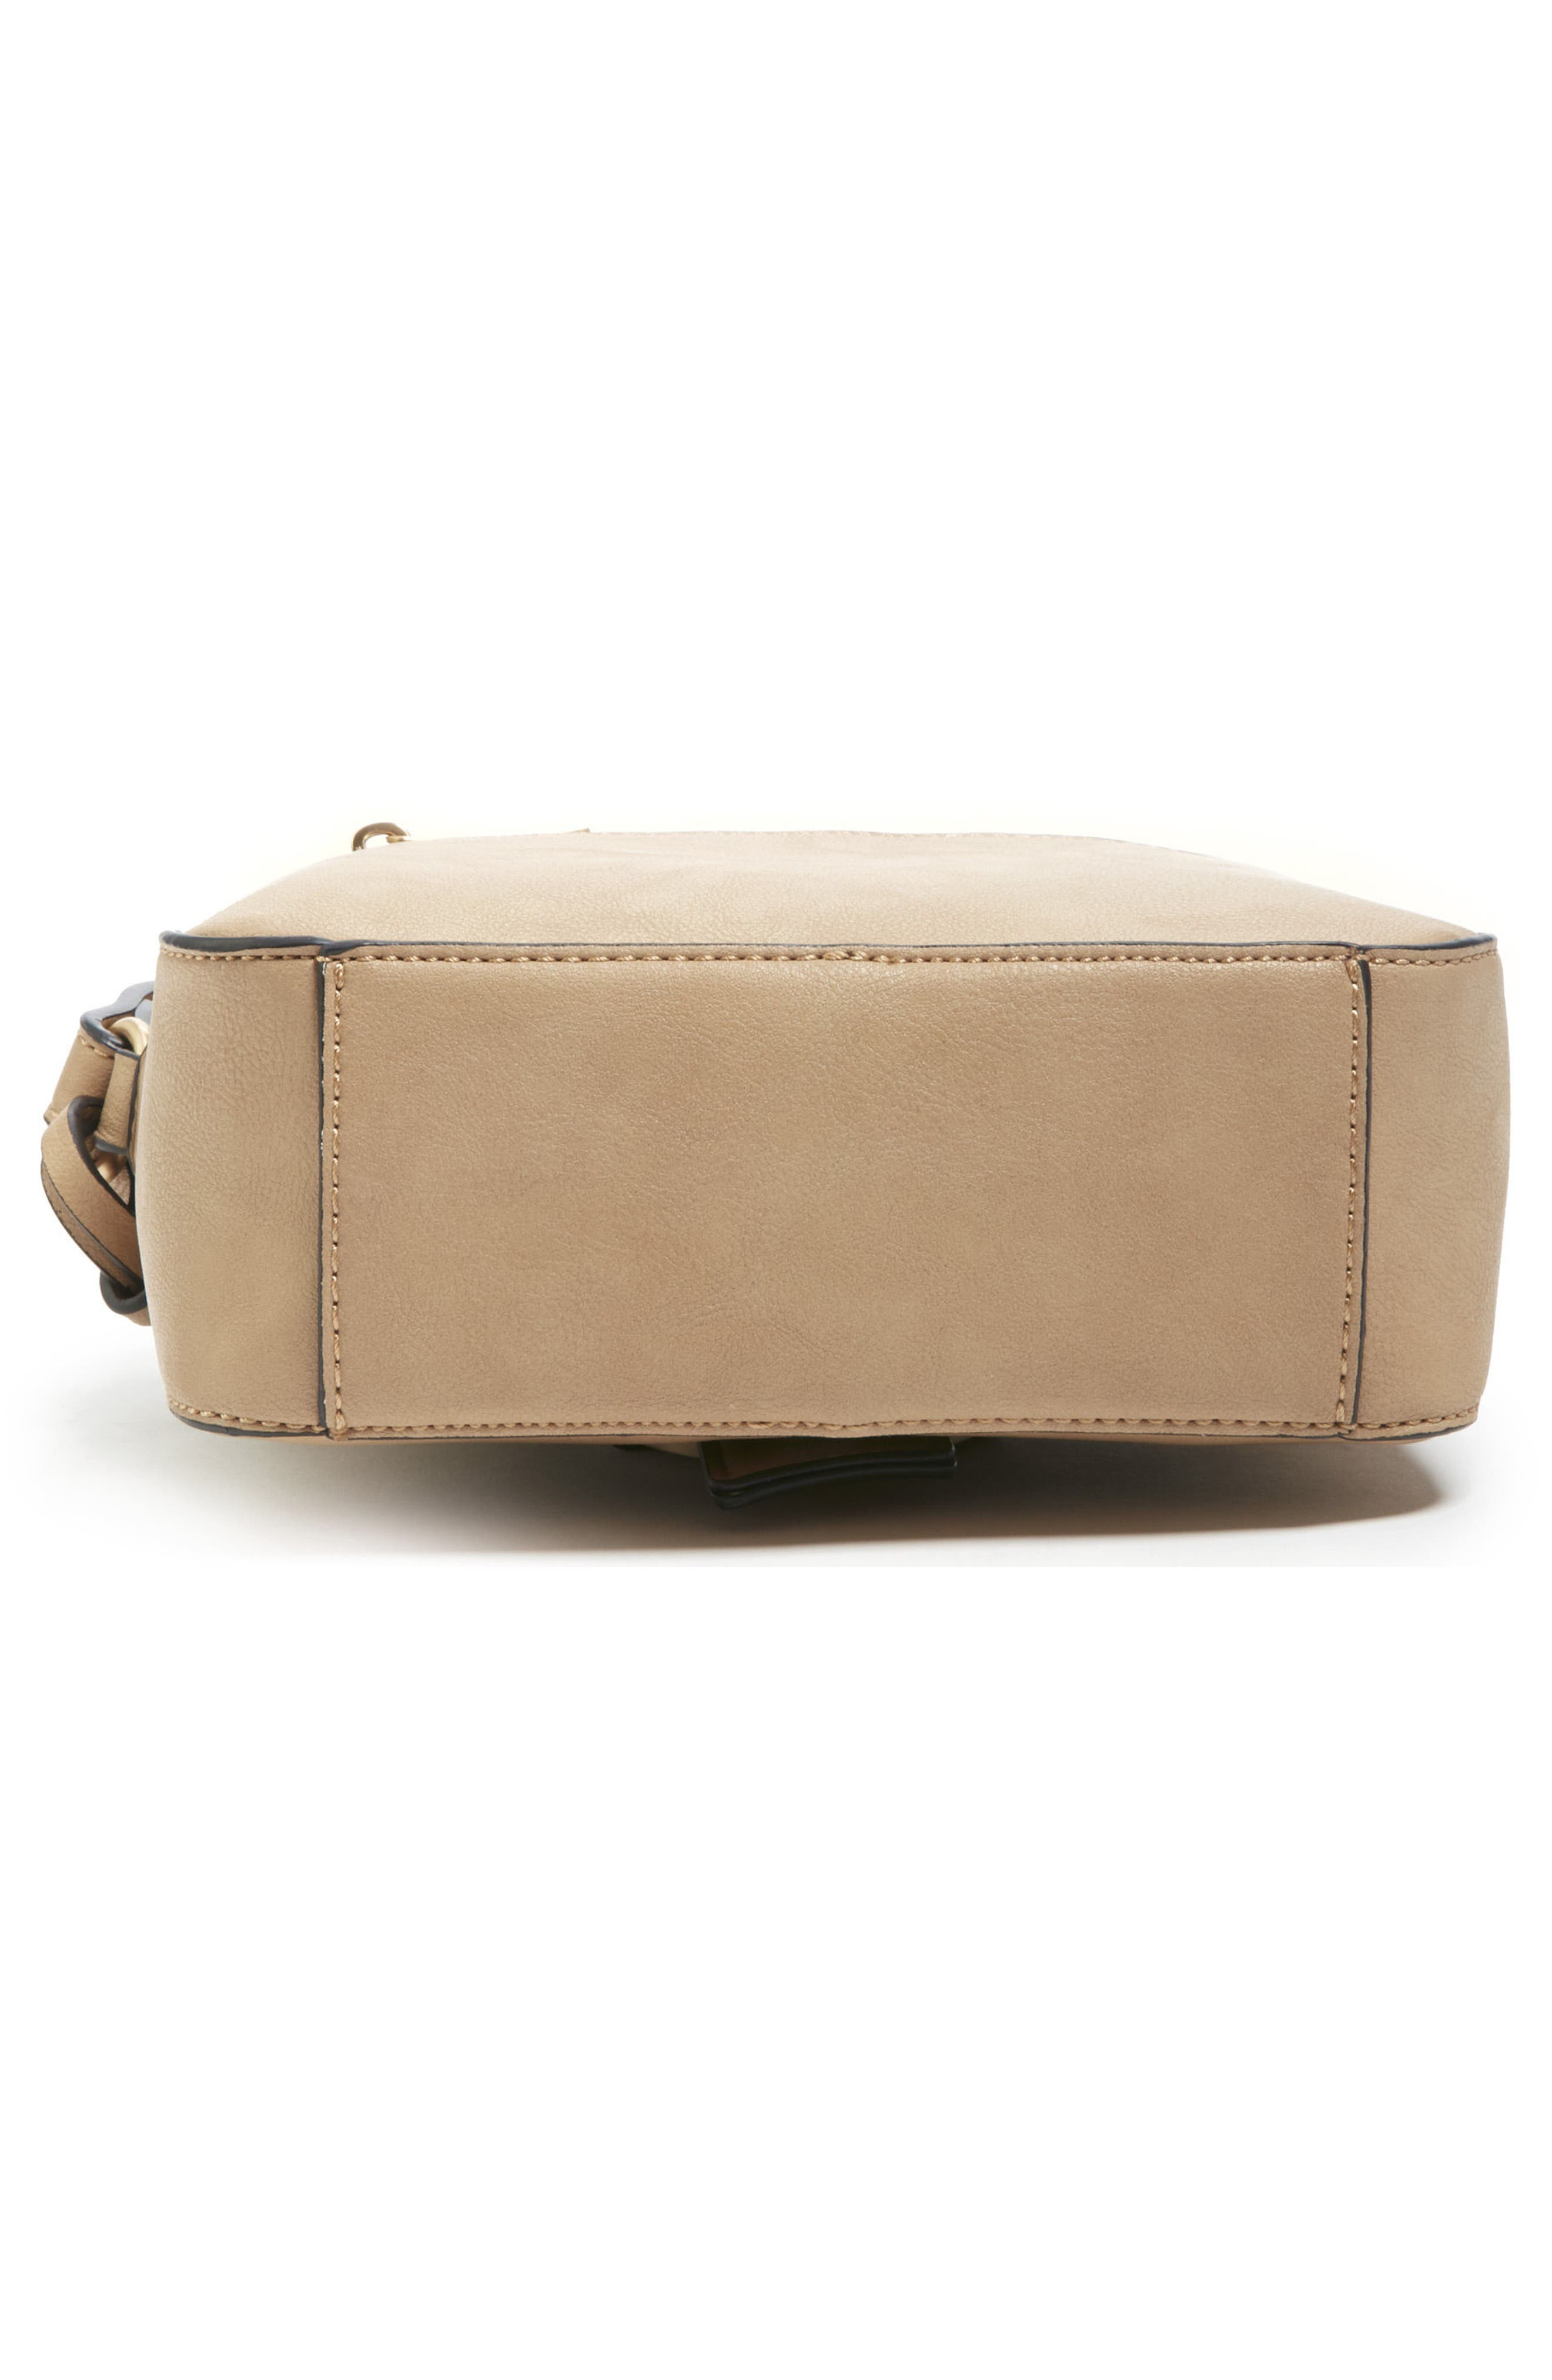 Faux Leather Camera Crossbody Bag,                             Alternate thumbnail 5, color,                             251